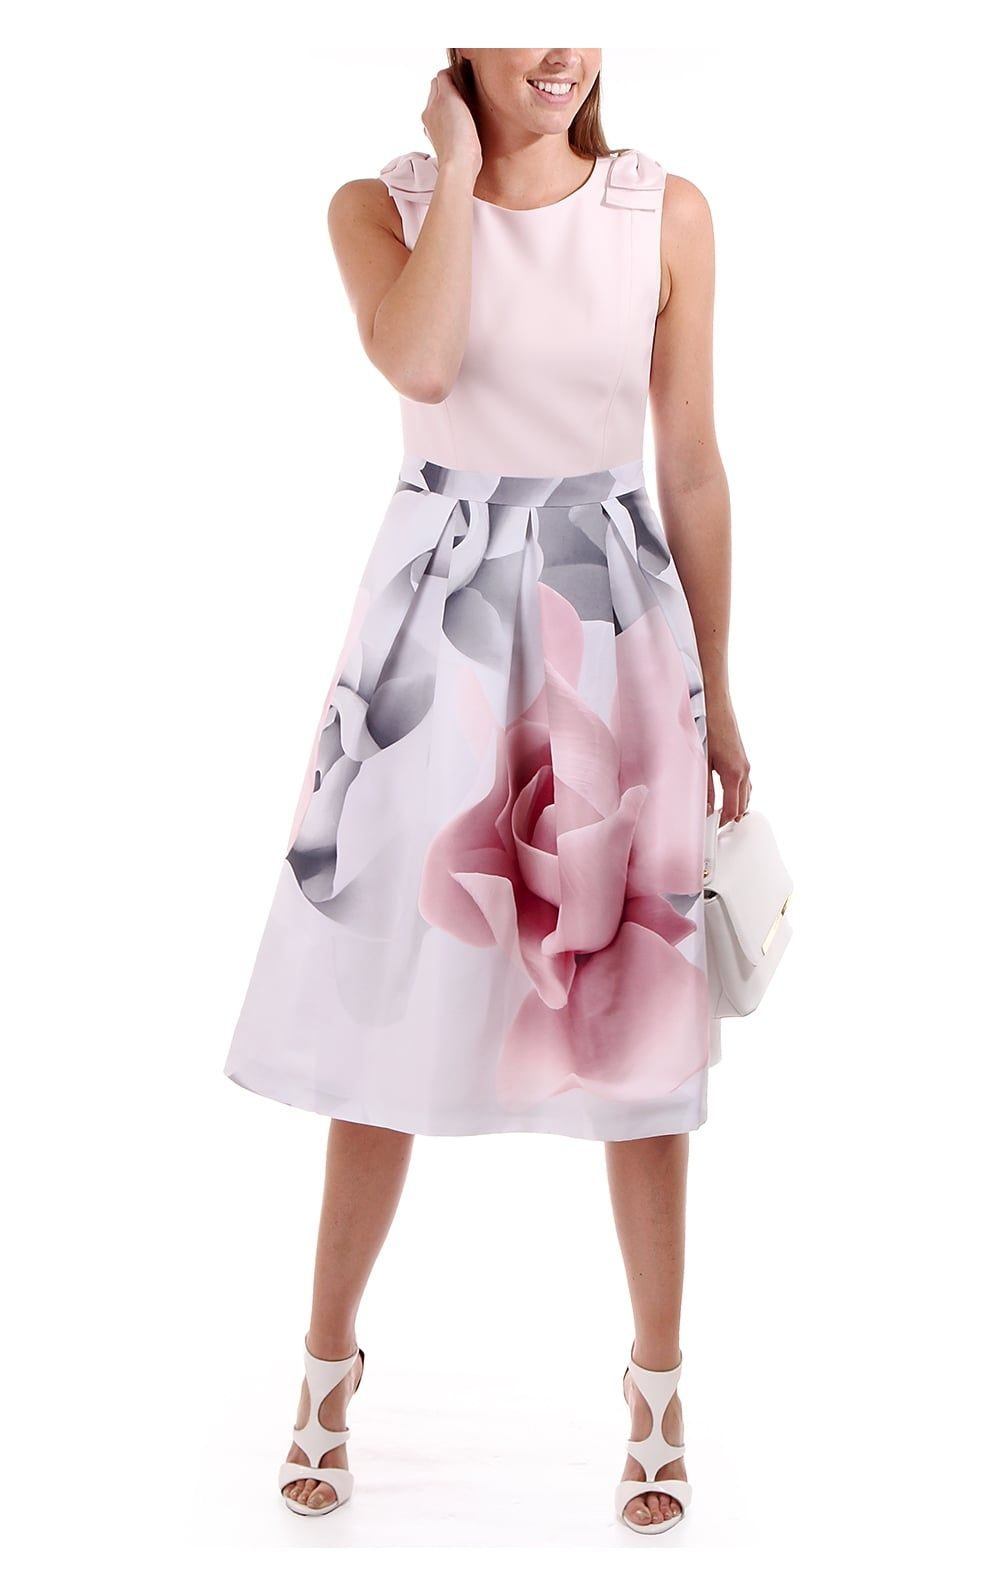 51a6cb2d2838e Ted Baker Womens Riina Porcelain Rose Bow Dress Ecru